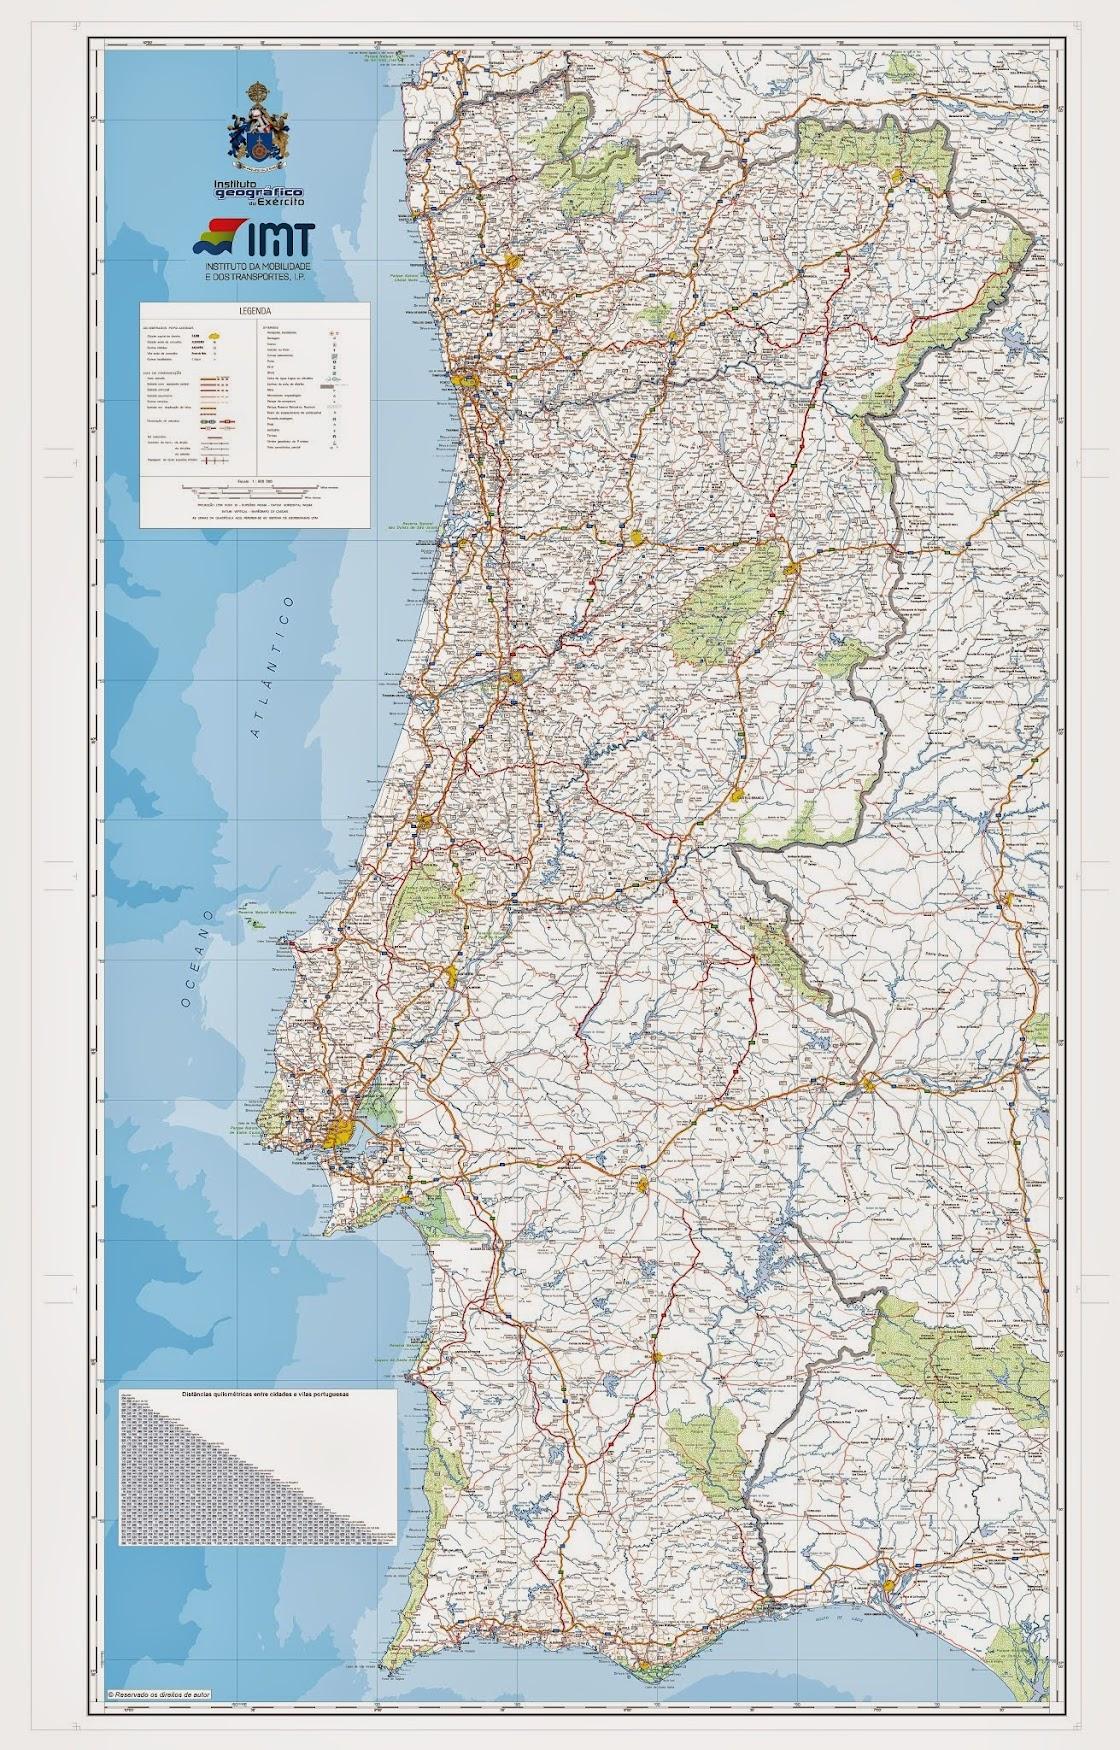 mapa portugal 2015 Estradas de Portugal   SkyscraperCity mapa portugal 2015